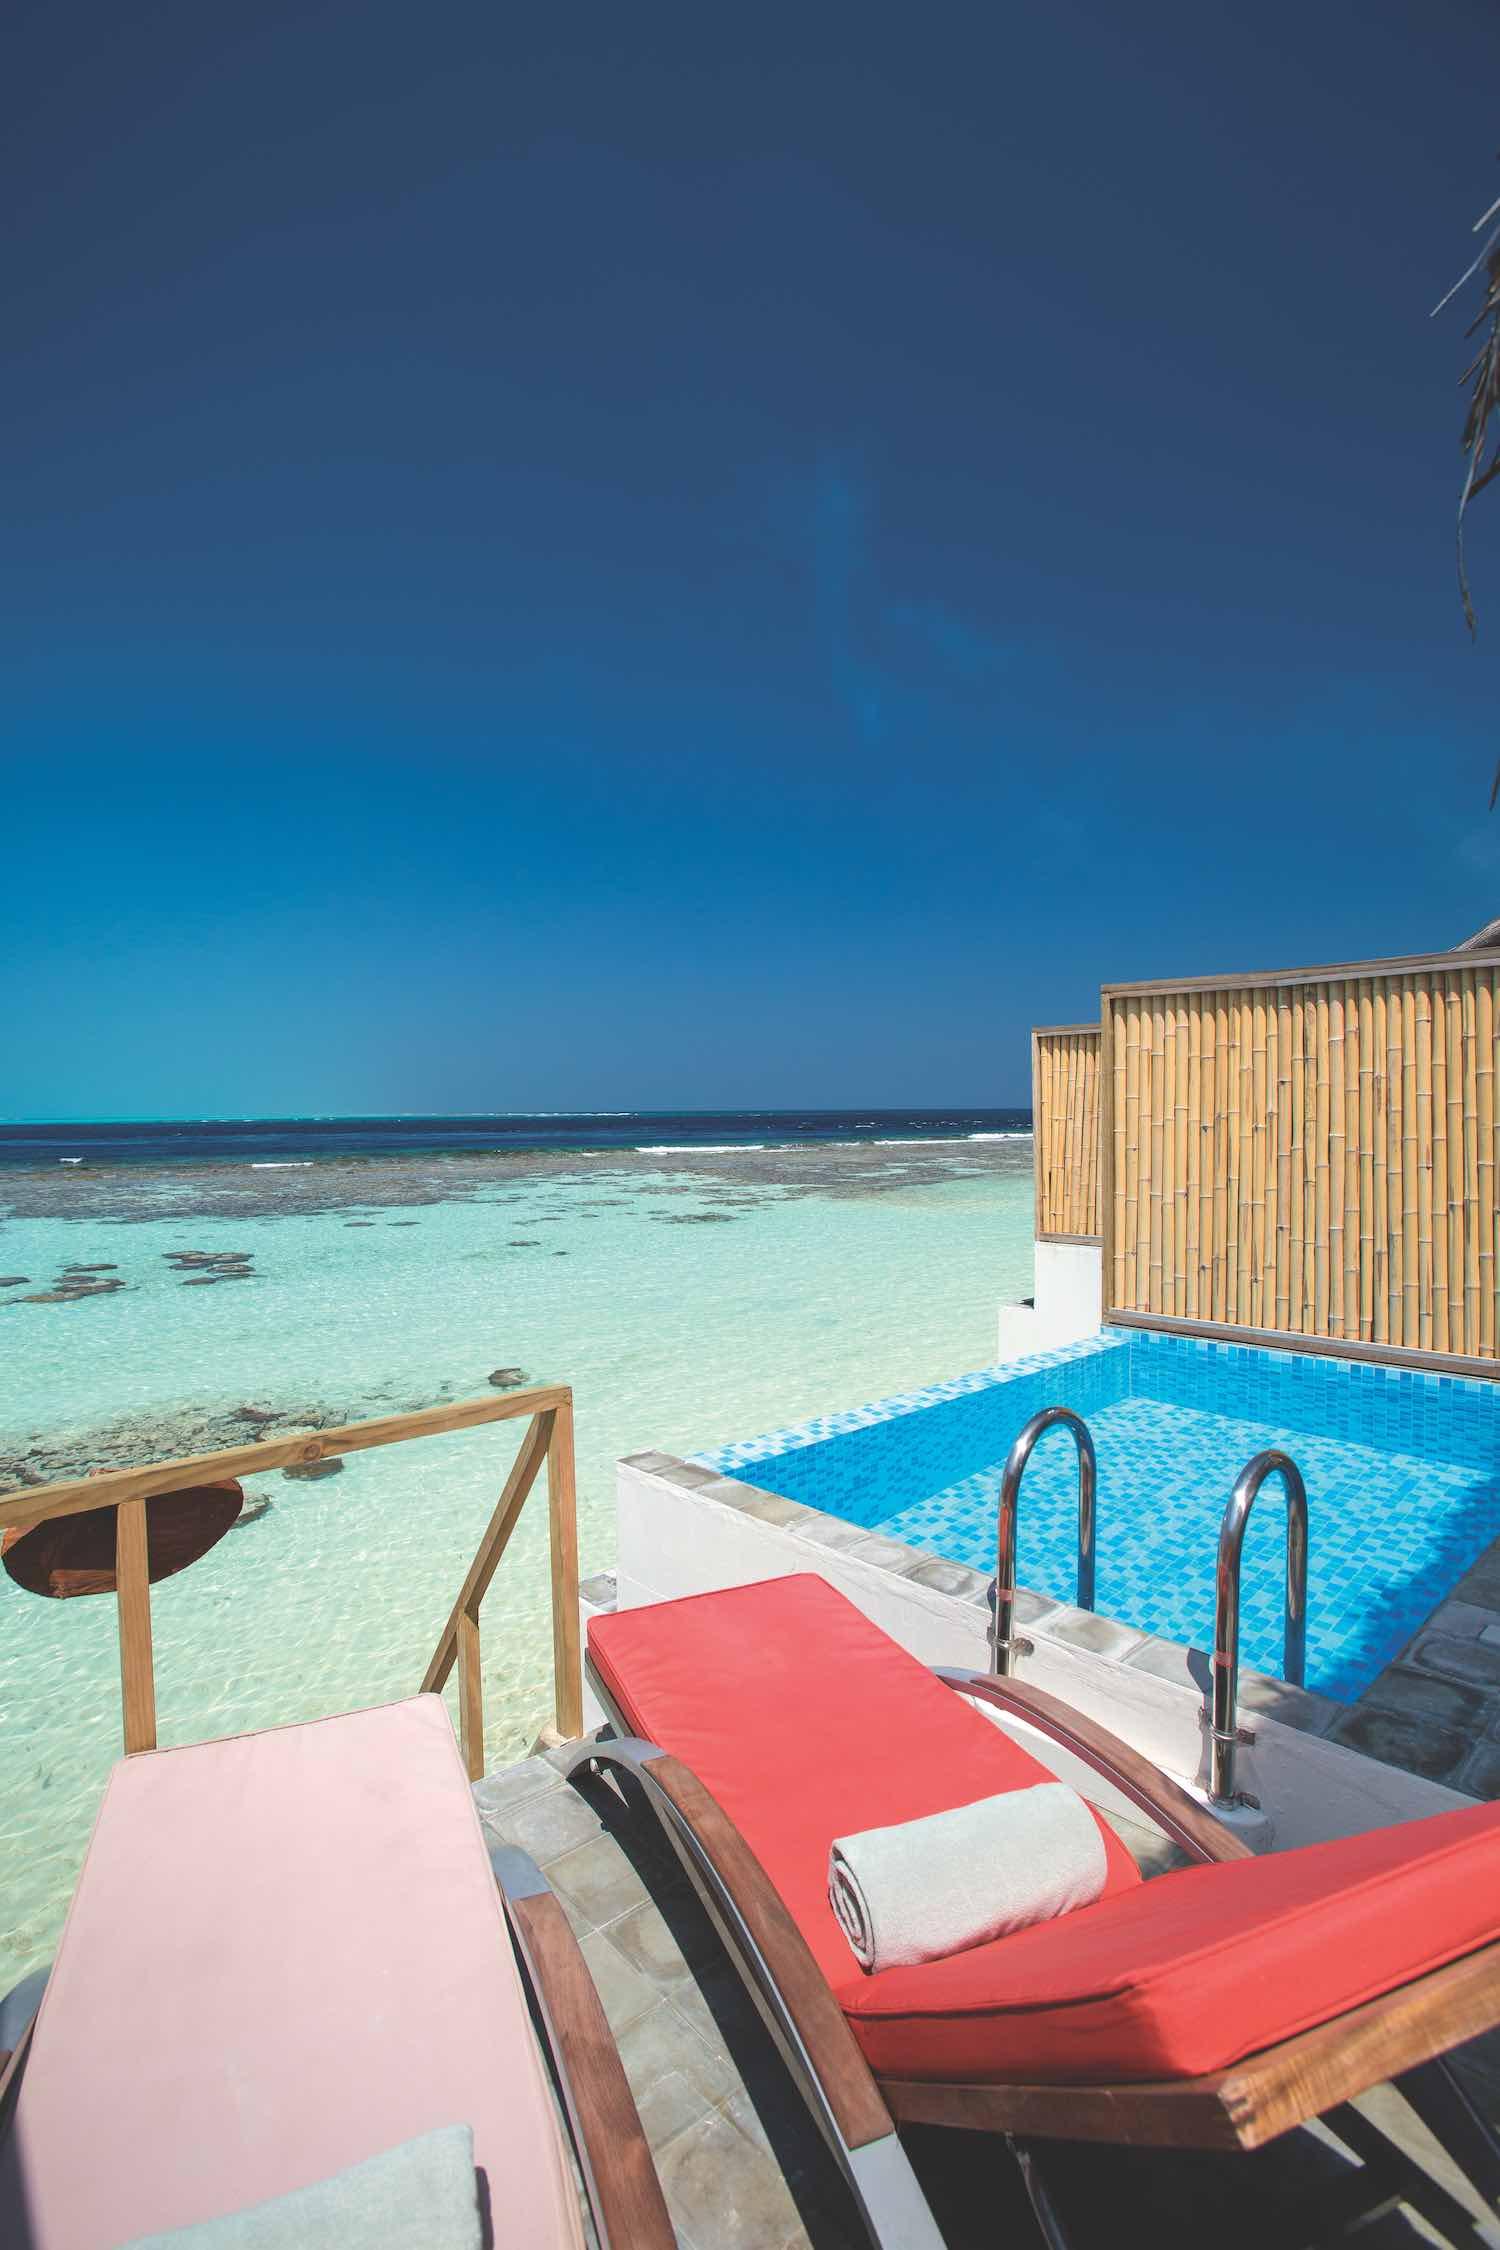 maldives-oblu-by-atmosphere-at-helengeli-lagoon-villa-17-holiday-honeymoon-vacation-invite-to-paradise.jpg